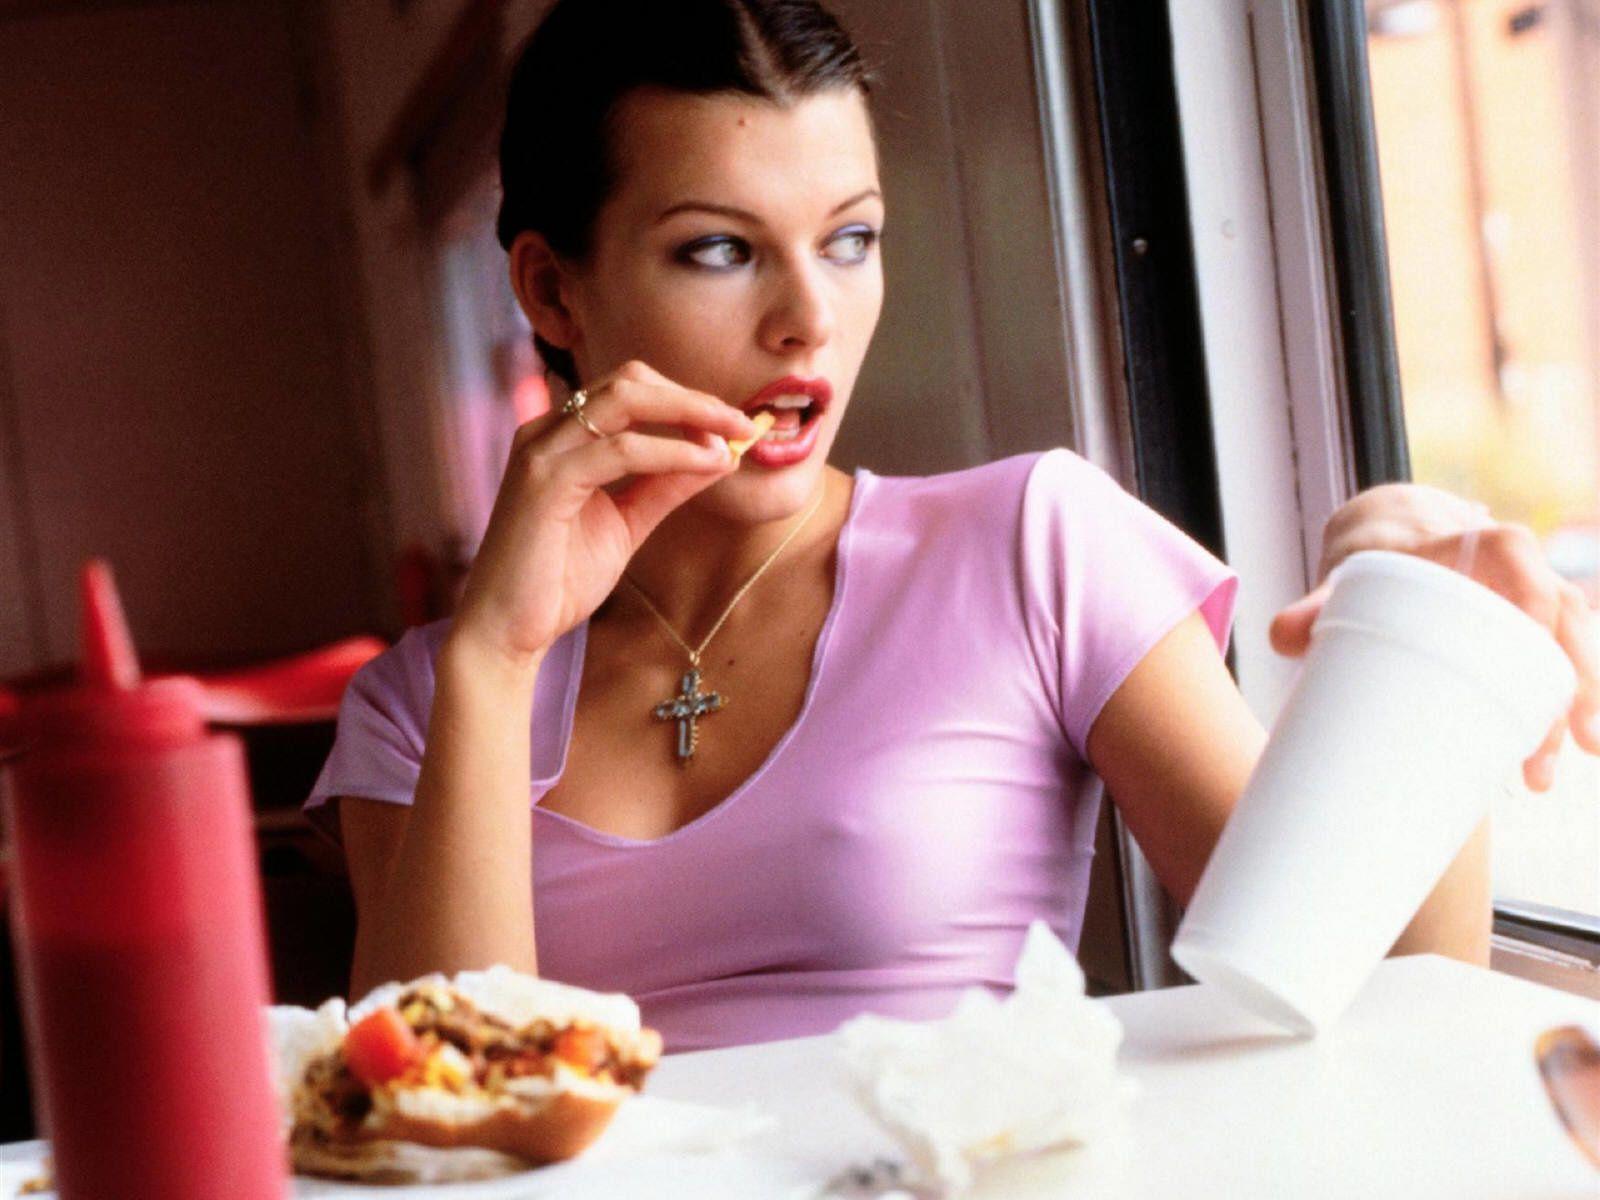 Bon appétit - Milla Jojovich - Femme - Nourriture - Wallpaper - Free